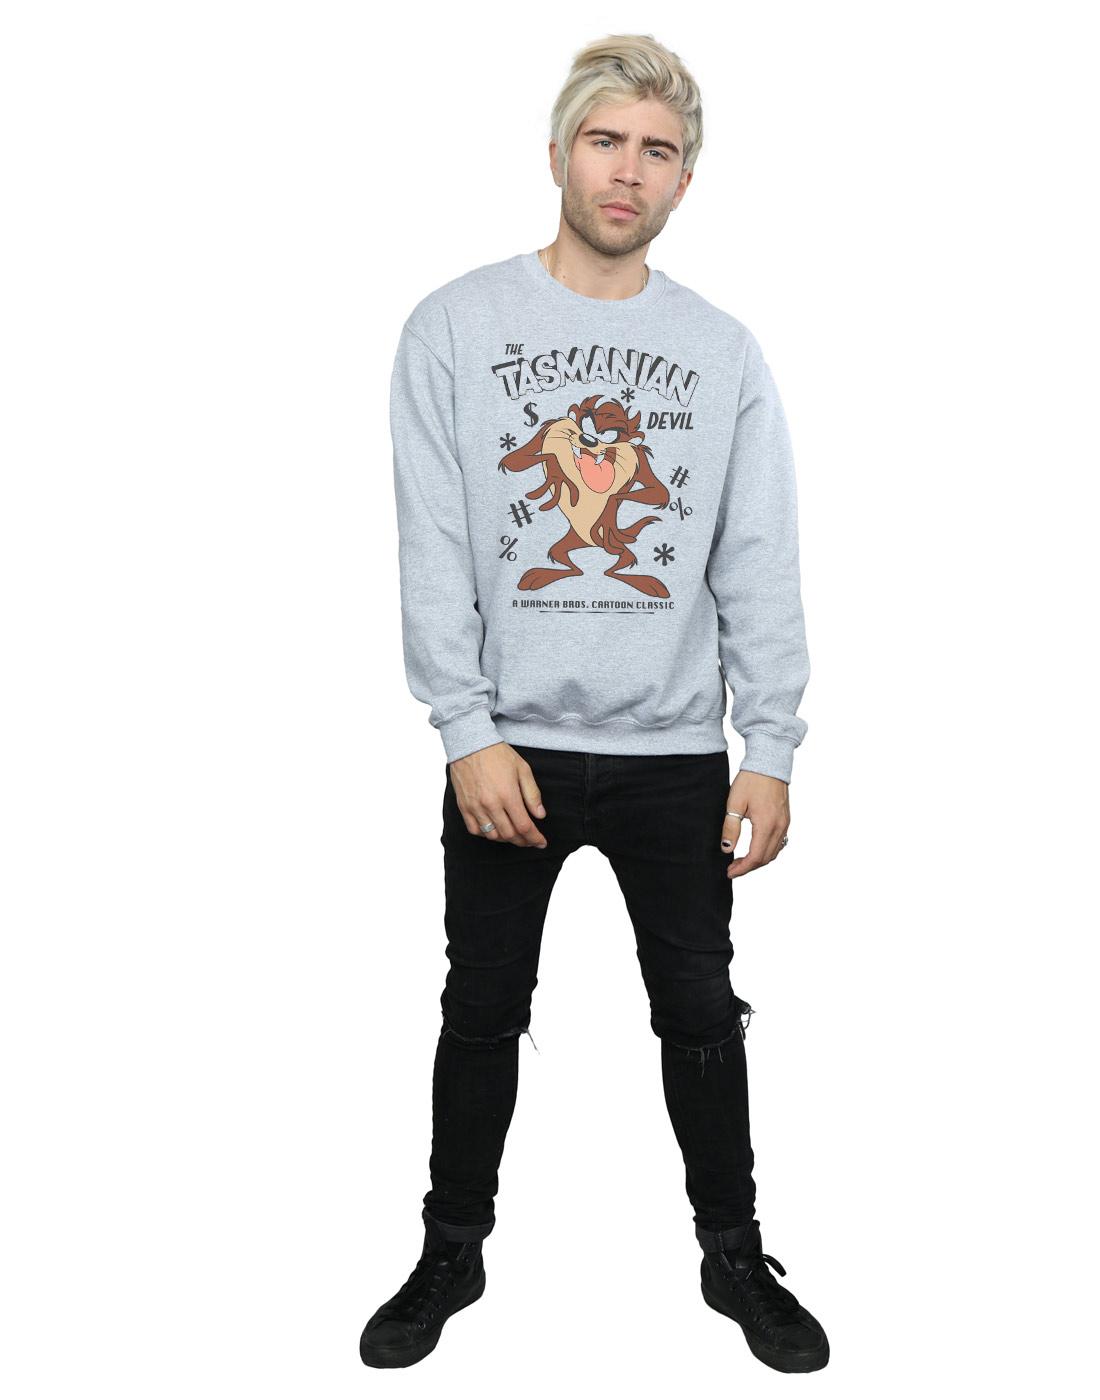 Looney Tunes Herren Vintage Tasmanian Devil Devil Devil Sweatshirt  | Exquisite (in) Verarbeitung  98a1c5